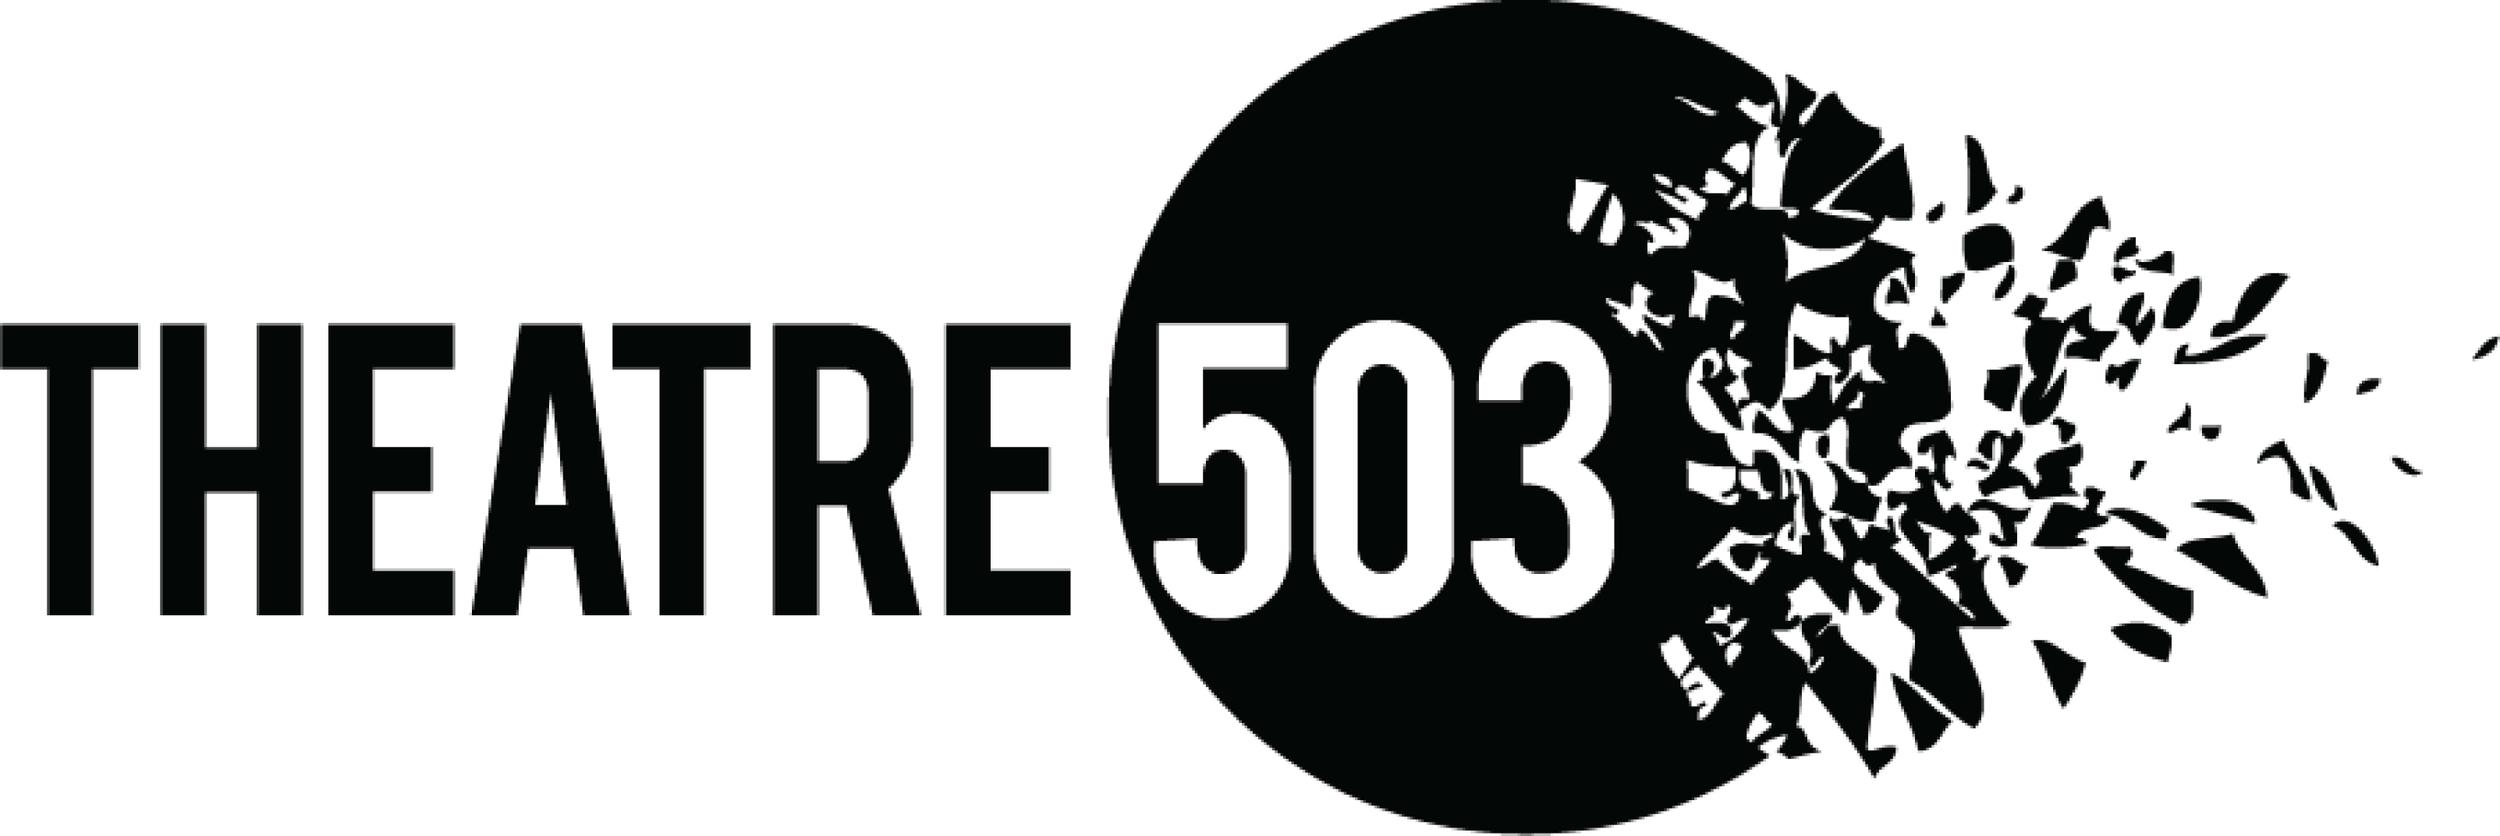 503Logonew.jpg